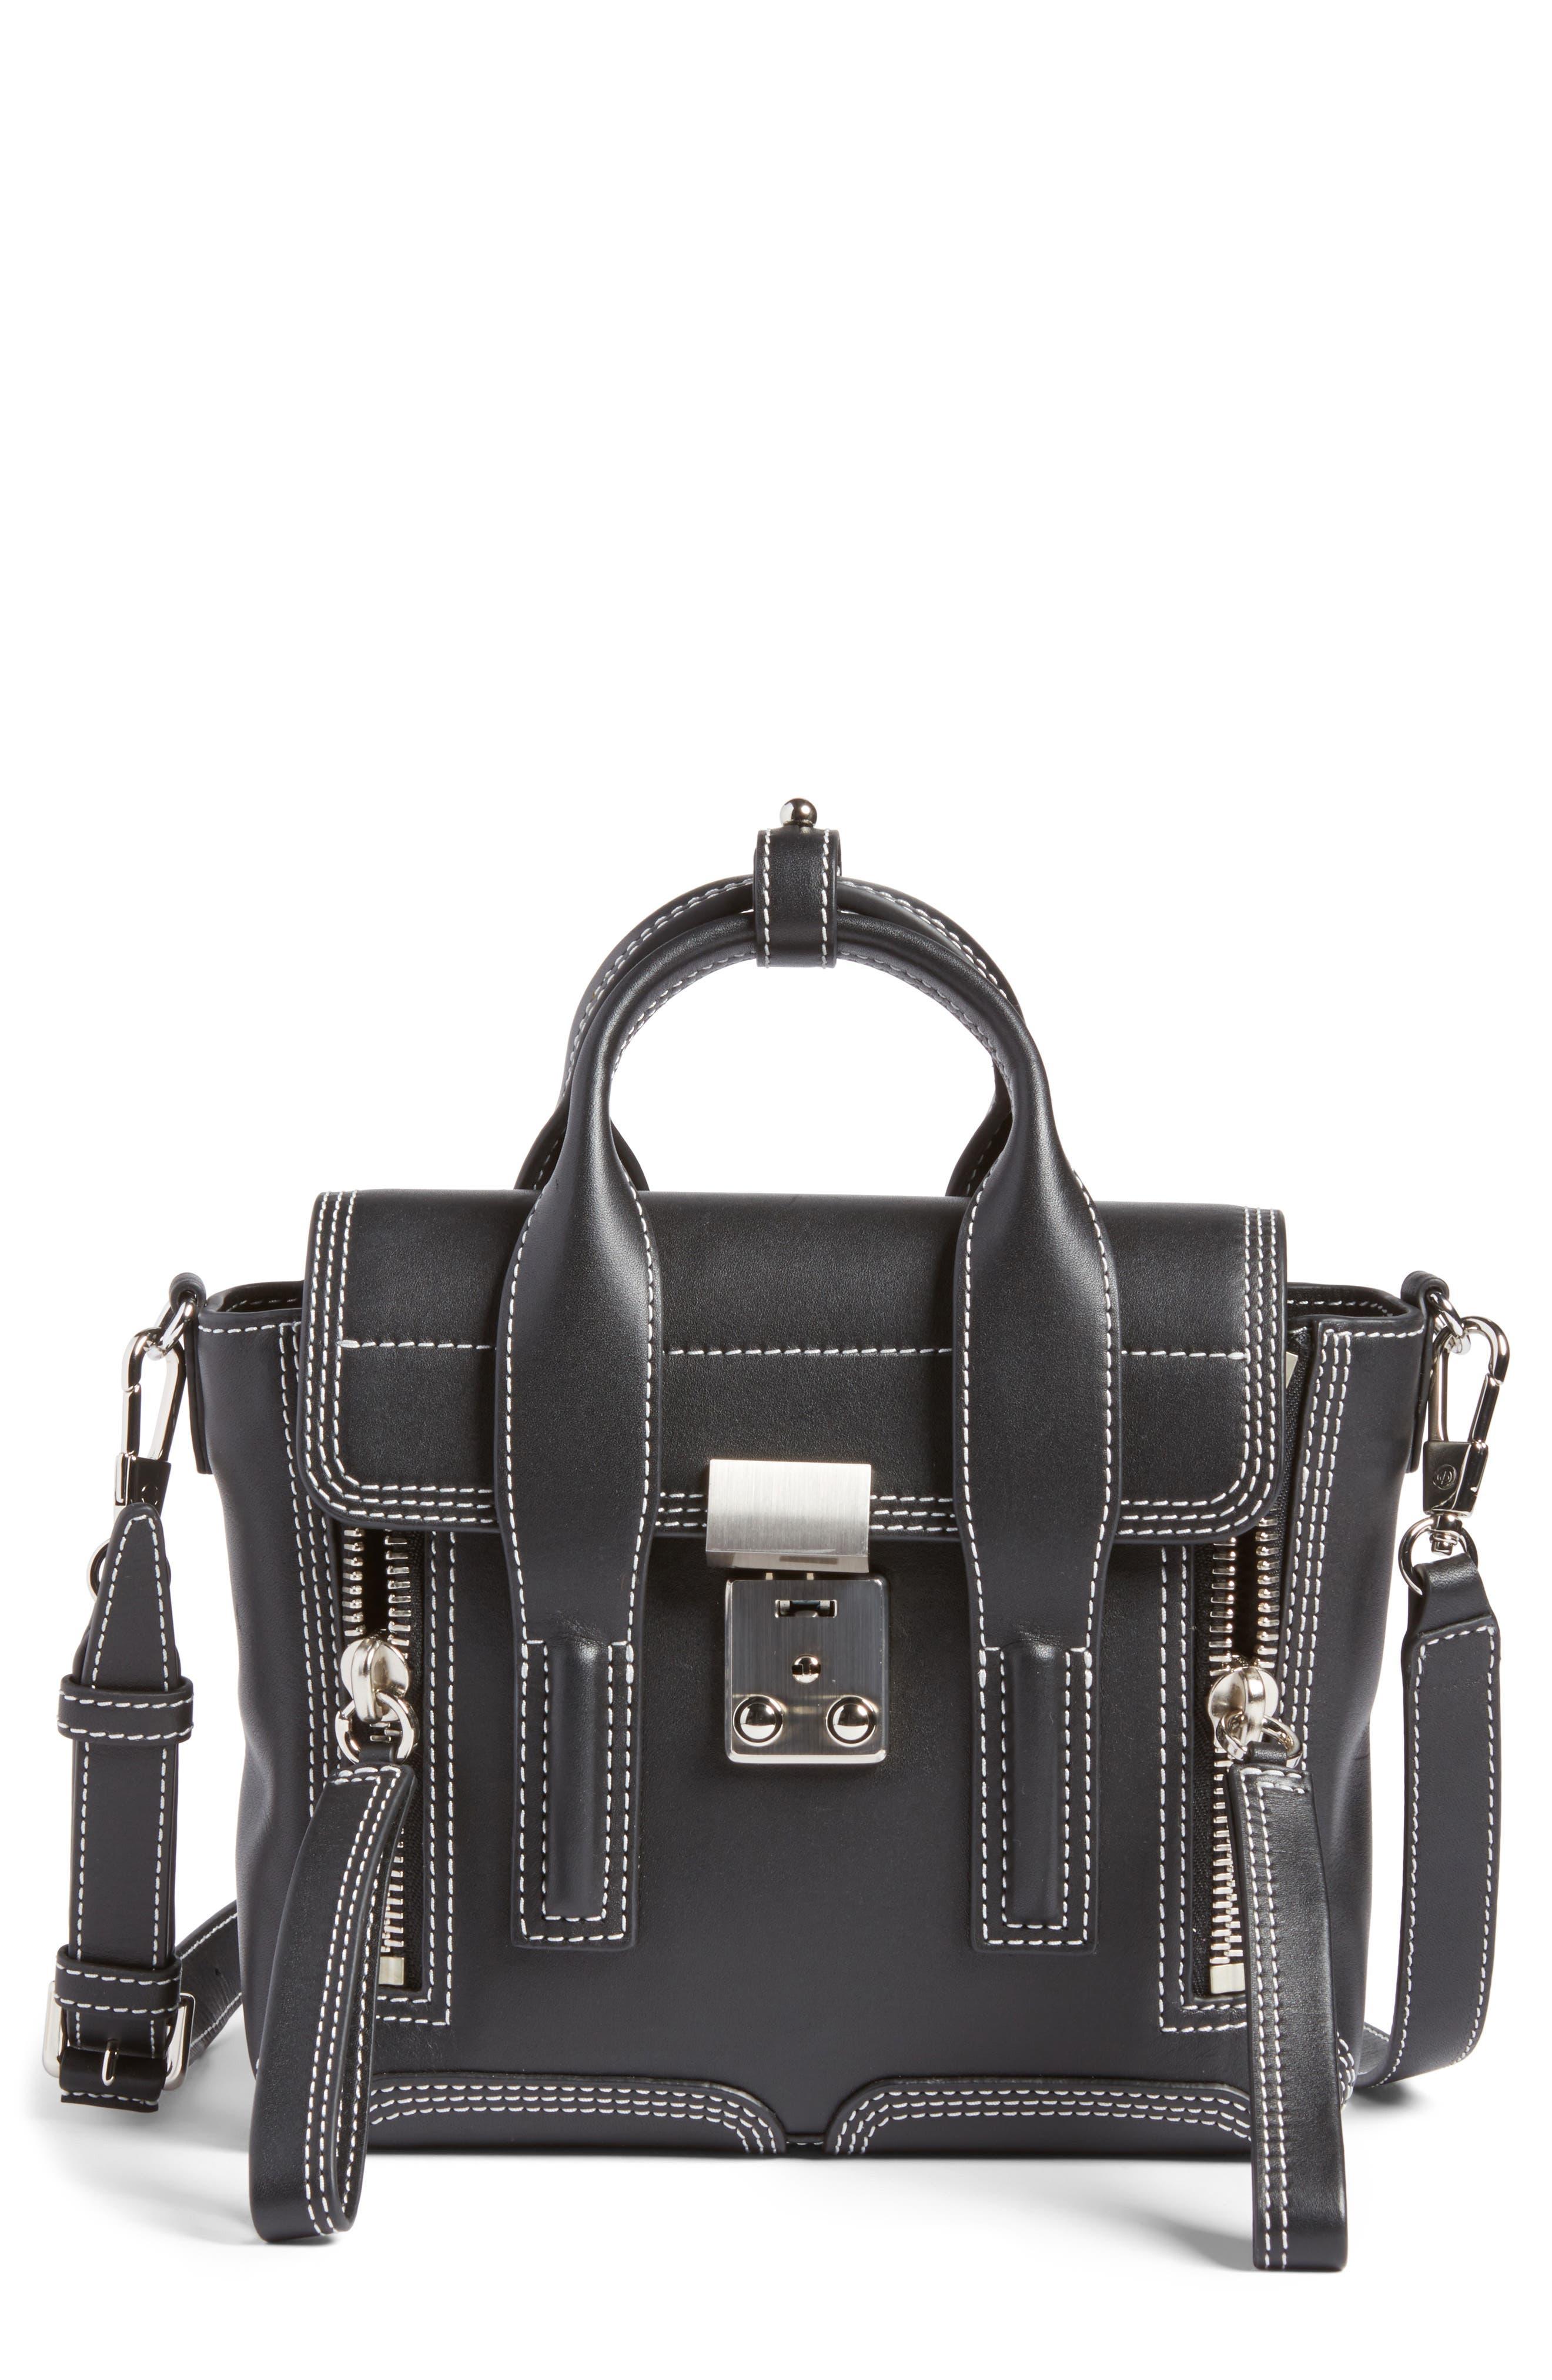 Main Image - 3.1 Phillip Lim Mini Pashli Leather Satchel